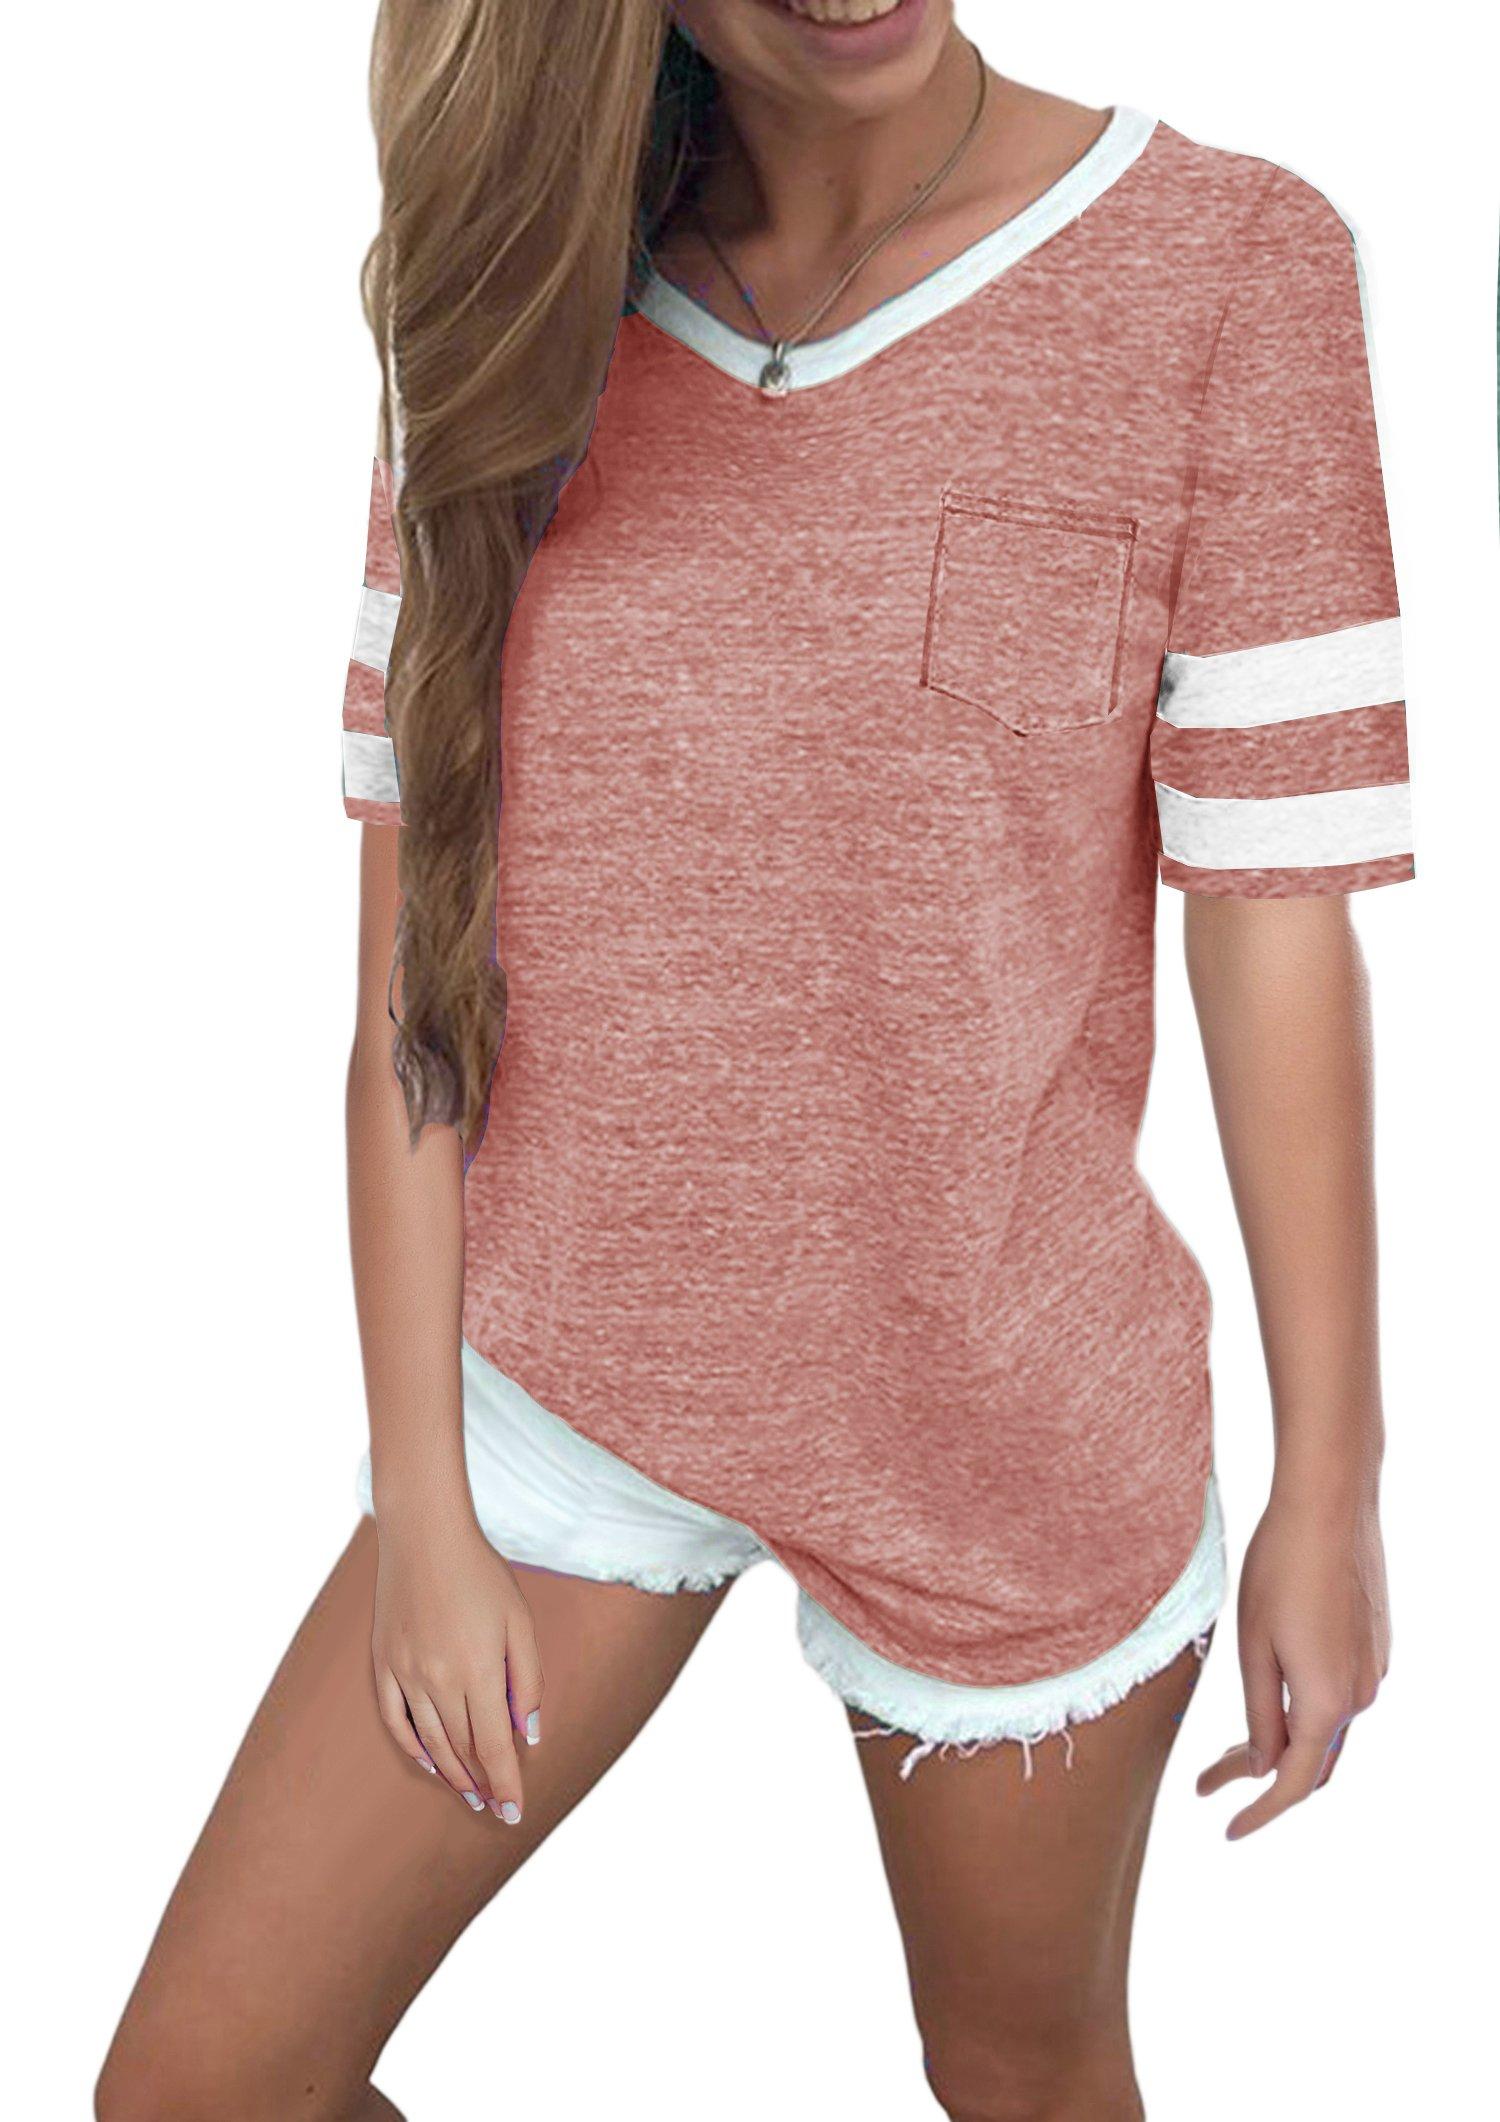 Twotwowin Women's Summer Tops Casual Cotton V Neck Sport T Shirt Short Sleeve Blouse(pk-l)